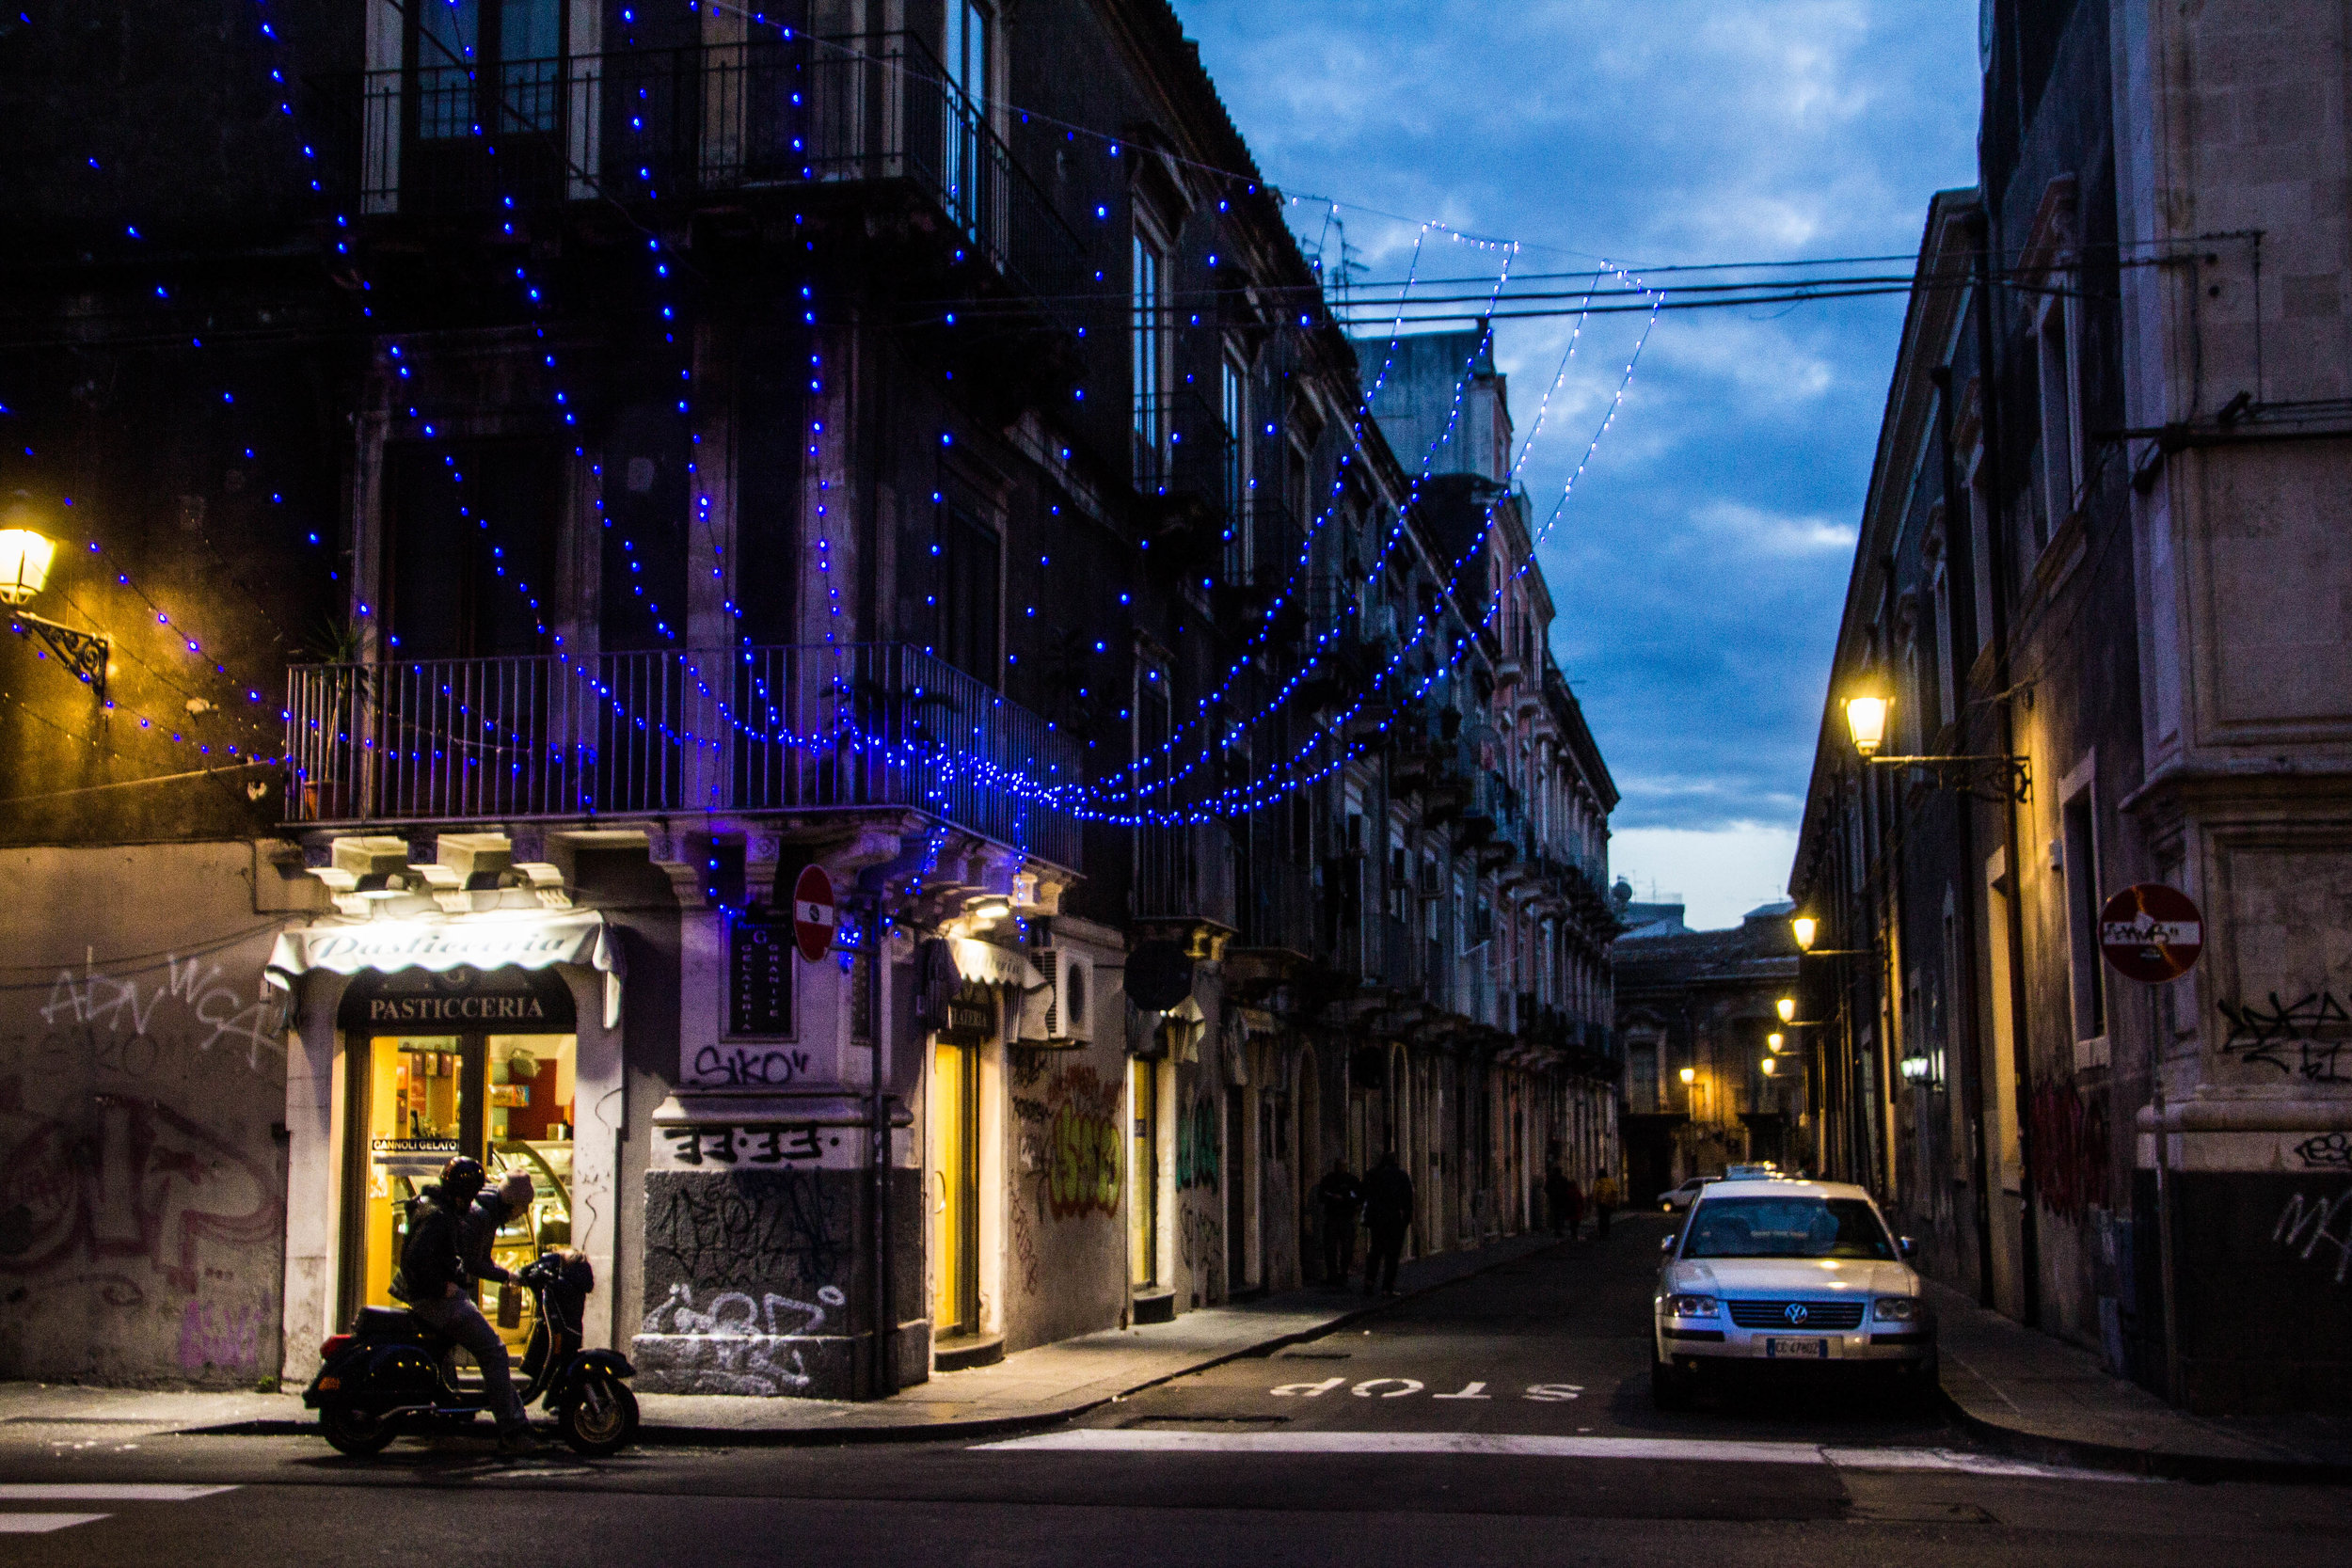 streets-catania-sicily-sicilia-45.jpg